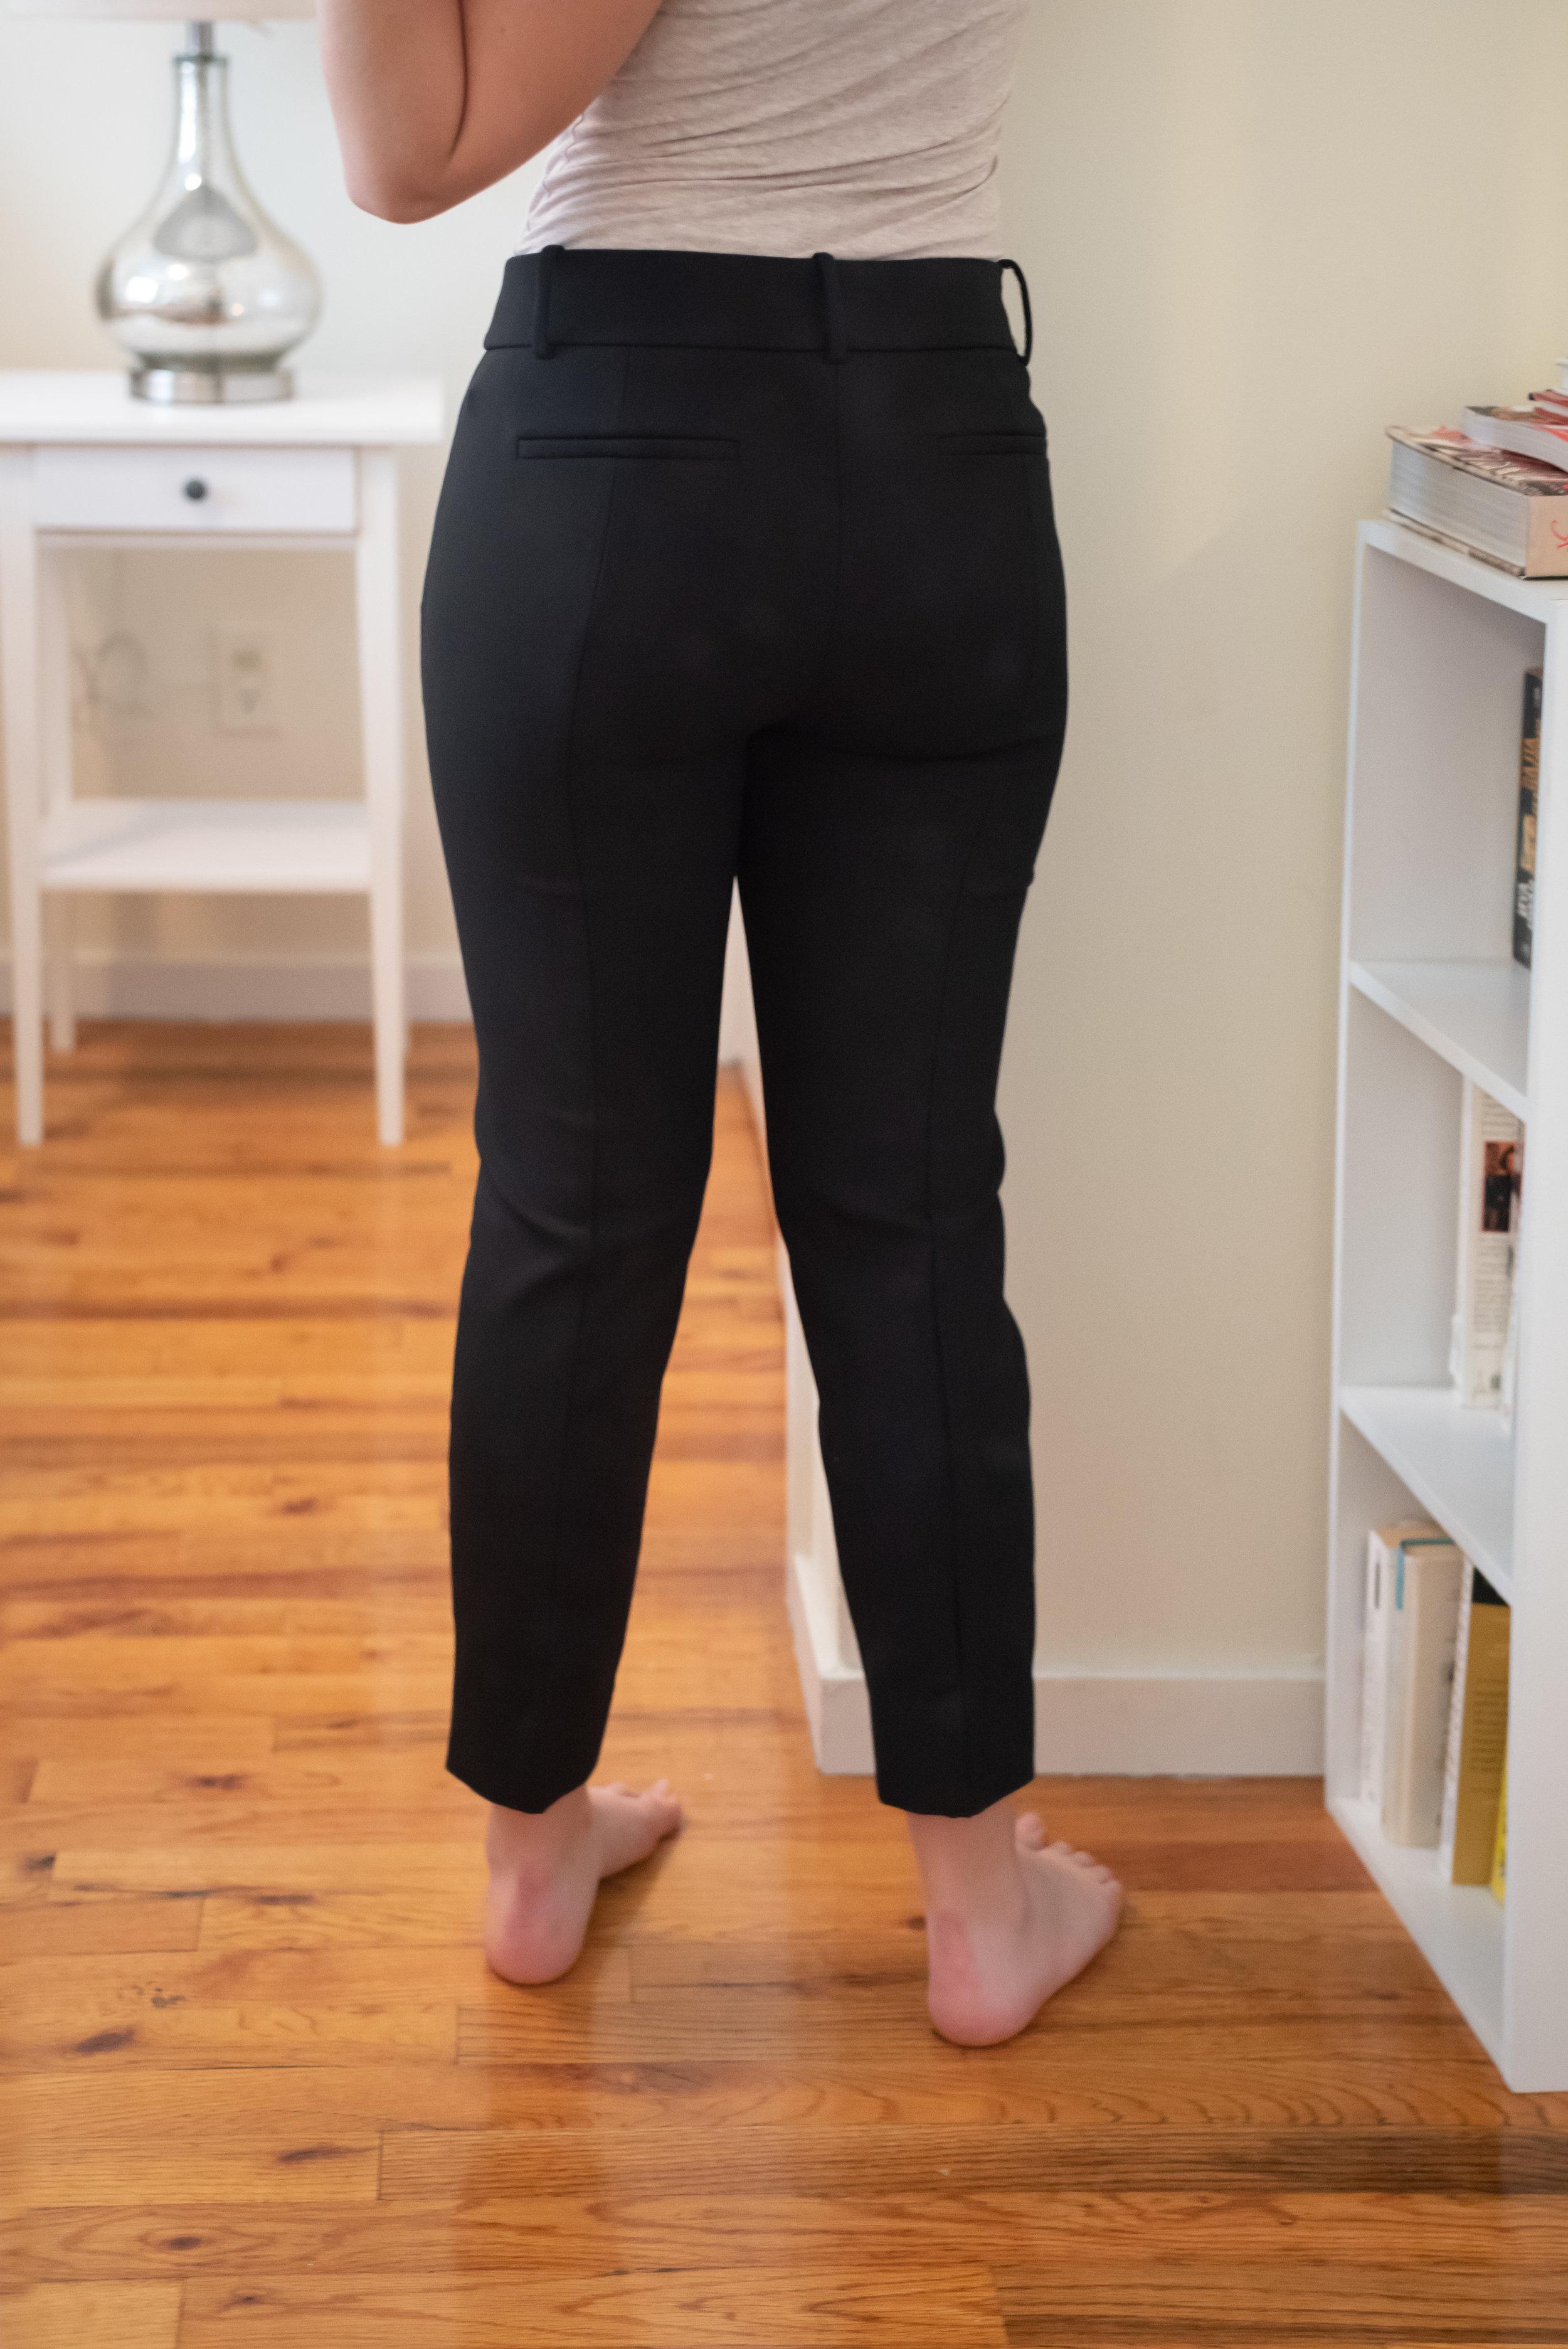 J. Crew Cameron Slim Crop Pant - Size 6 Petite - Back View